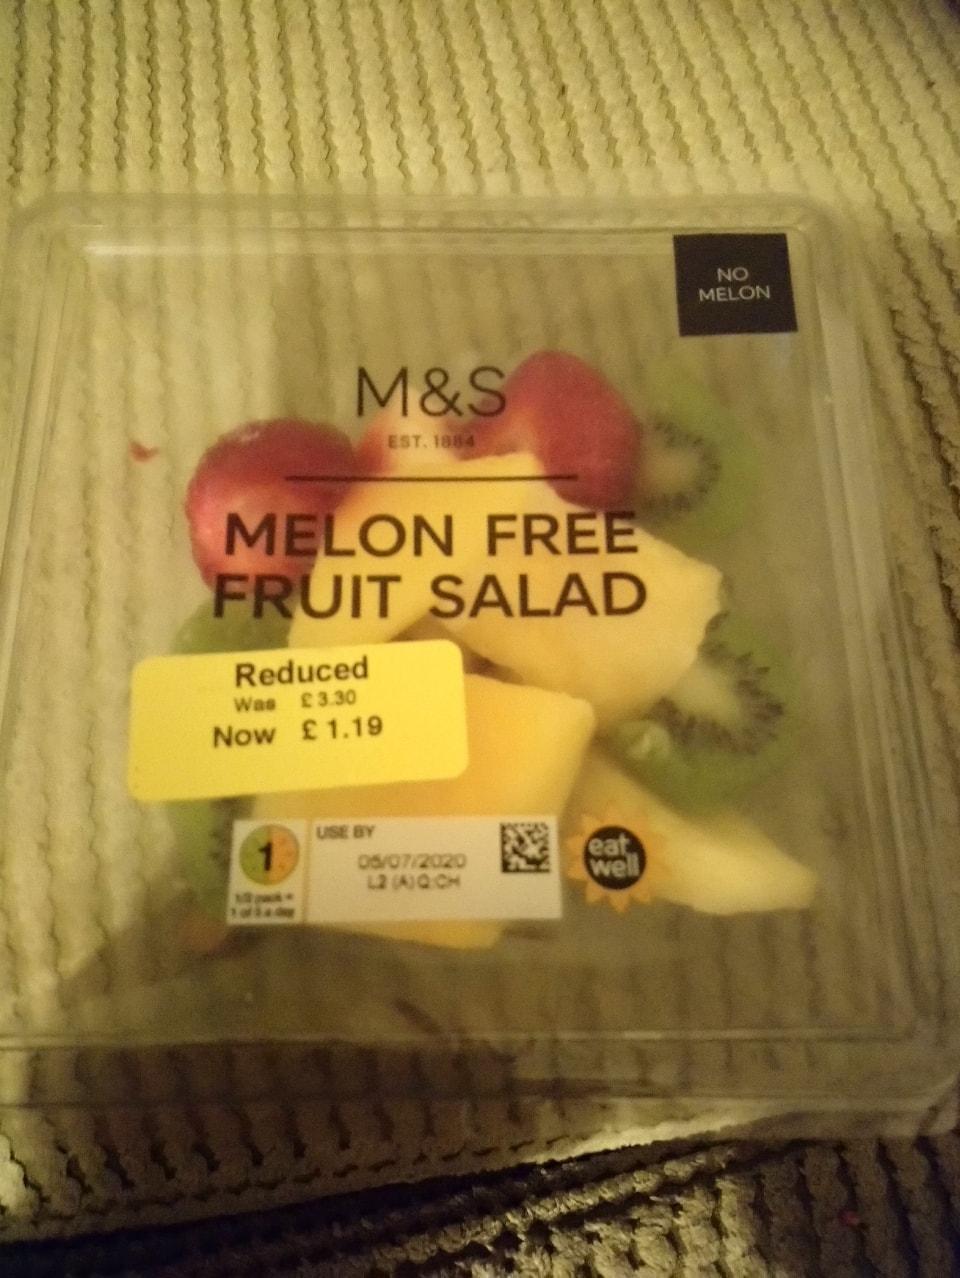 Melon free fruit salad